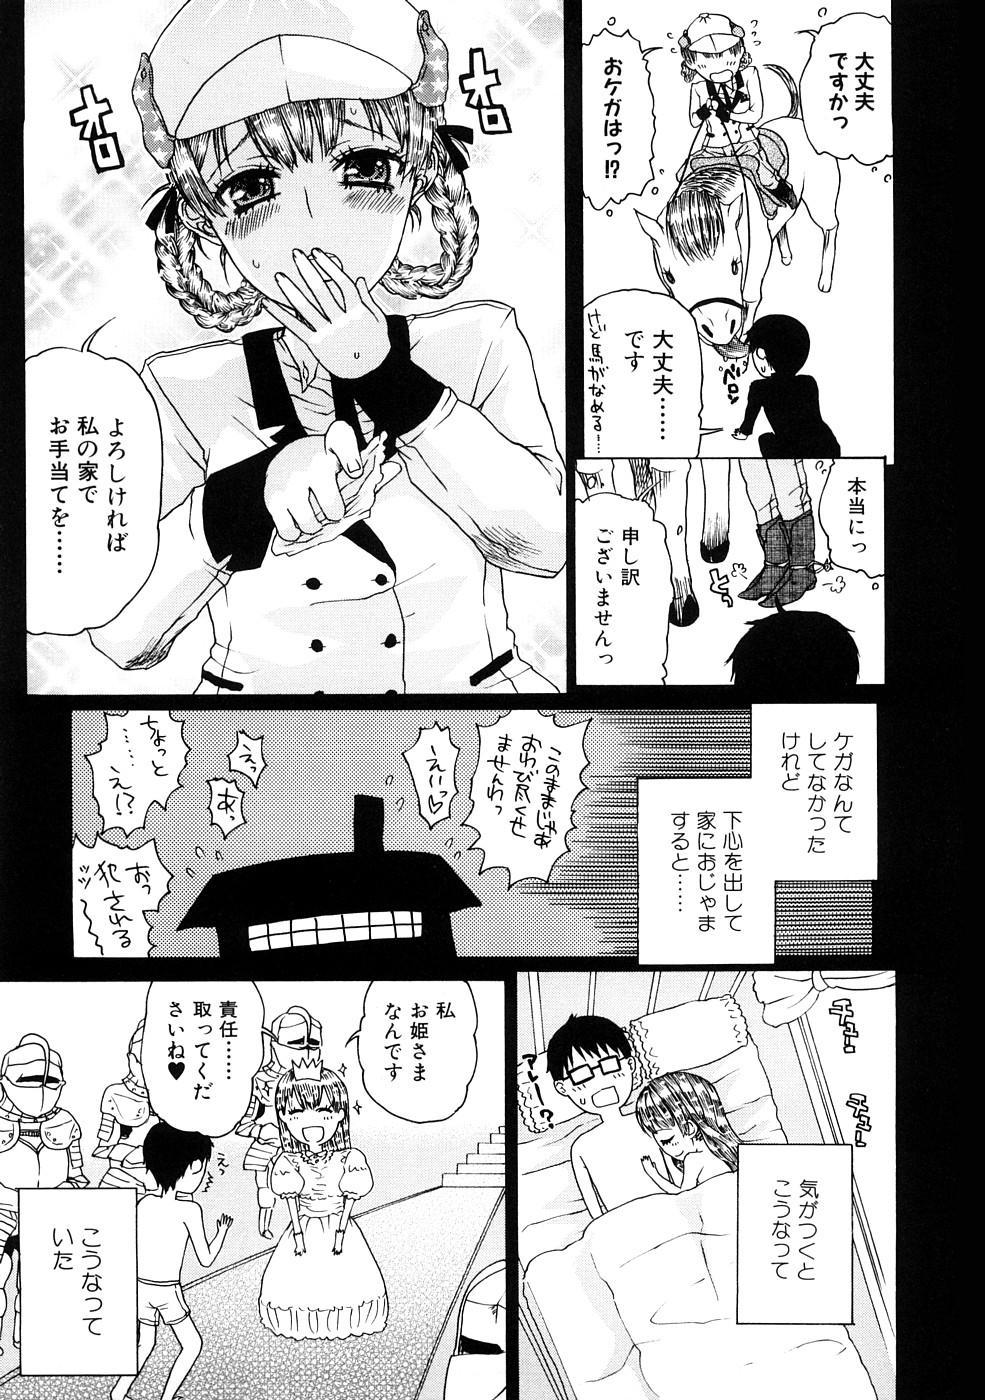 Ecchi de Jibunkatte de Kawaii Ko 8